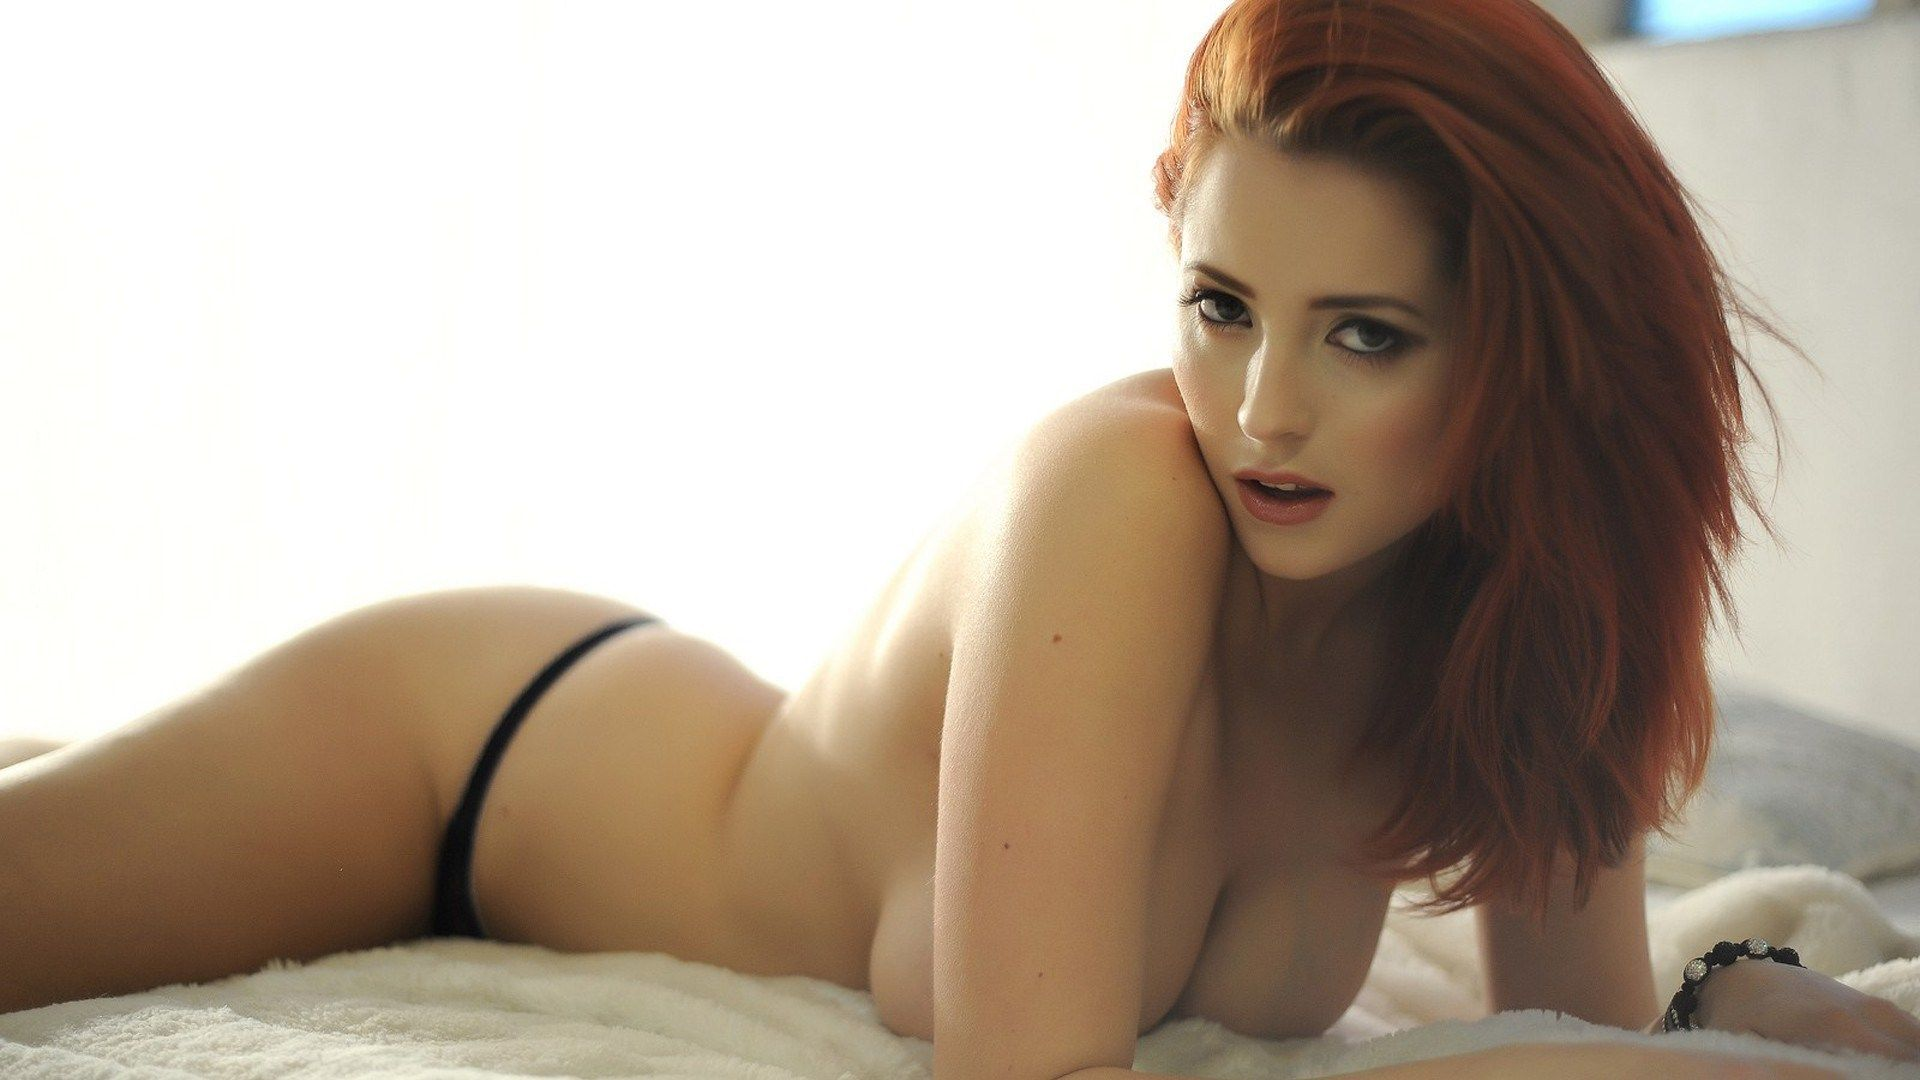 The beat sexy nude redheads, next door nikki topless video